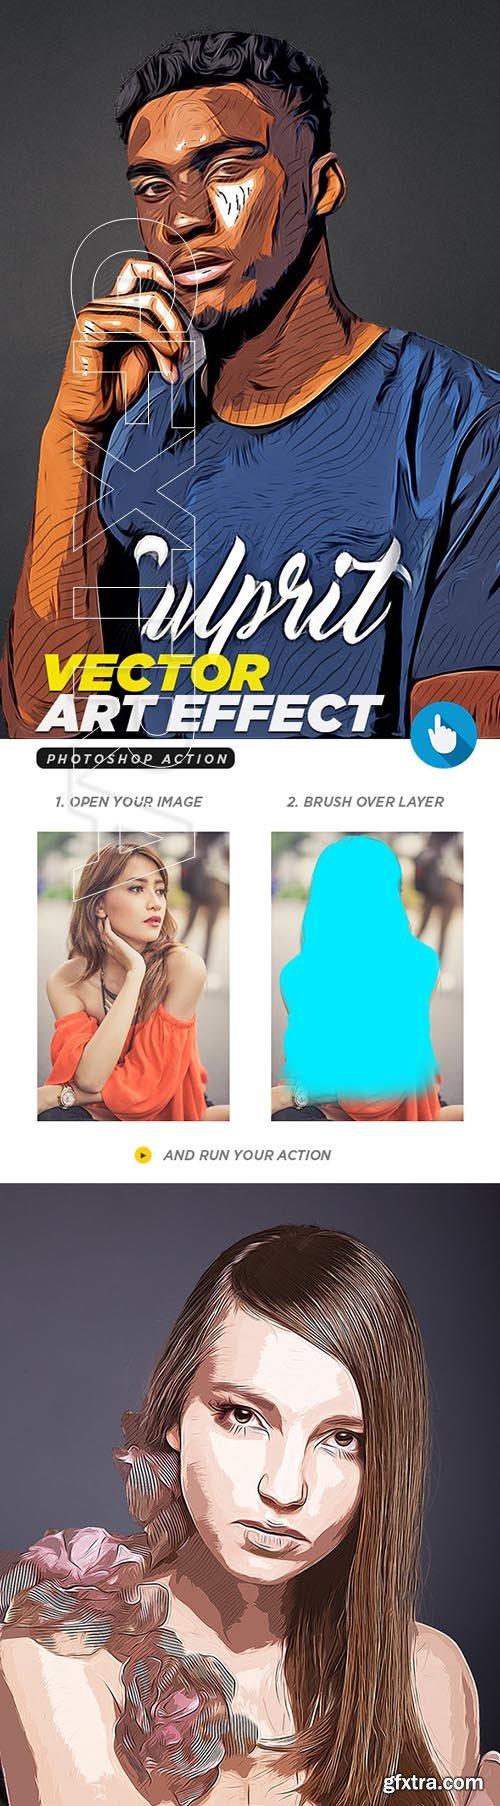 GraphicRiver - Vector Art Photoshop Action 21669828